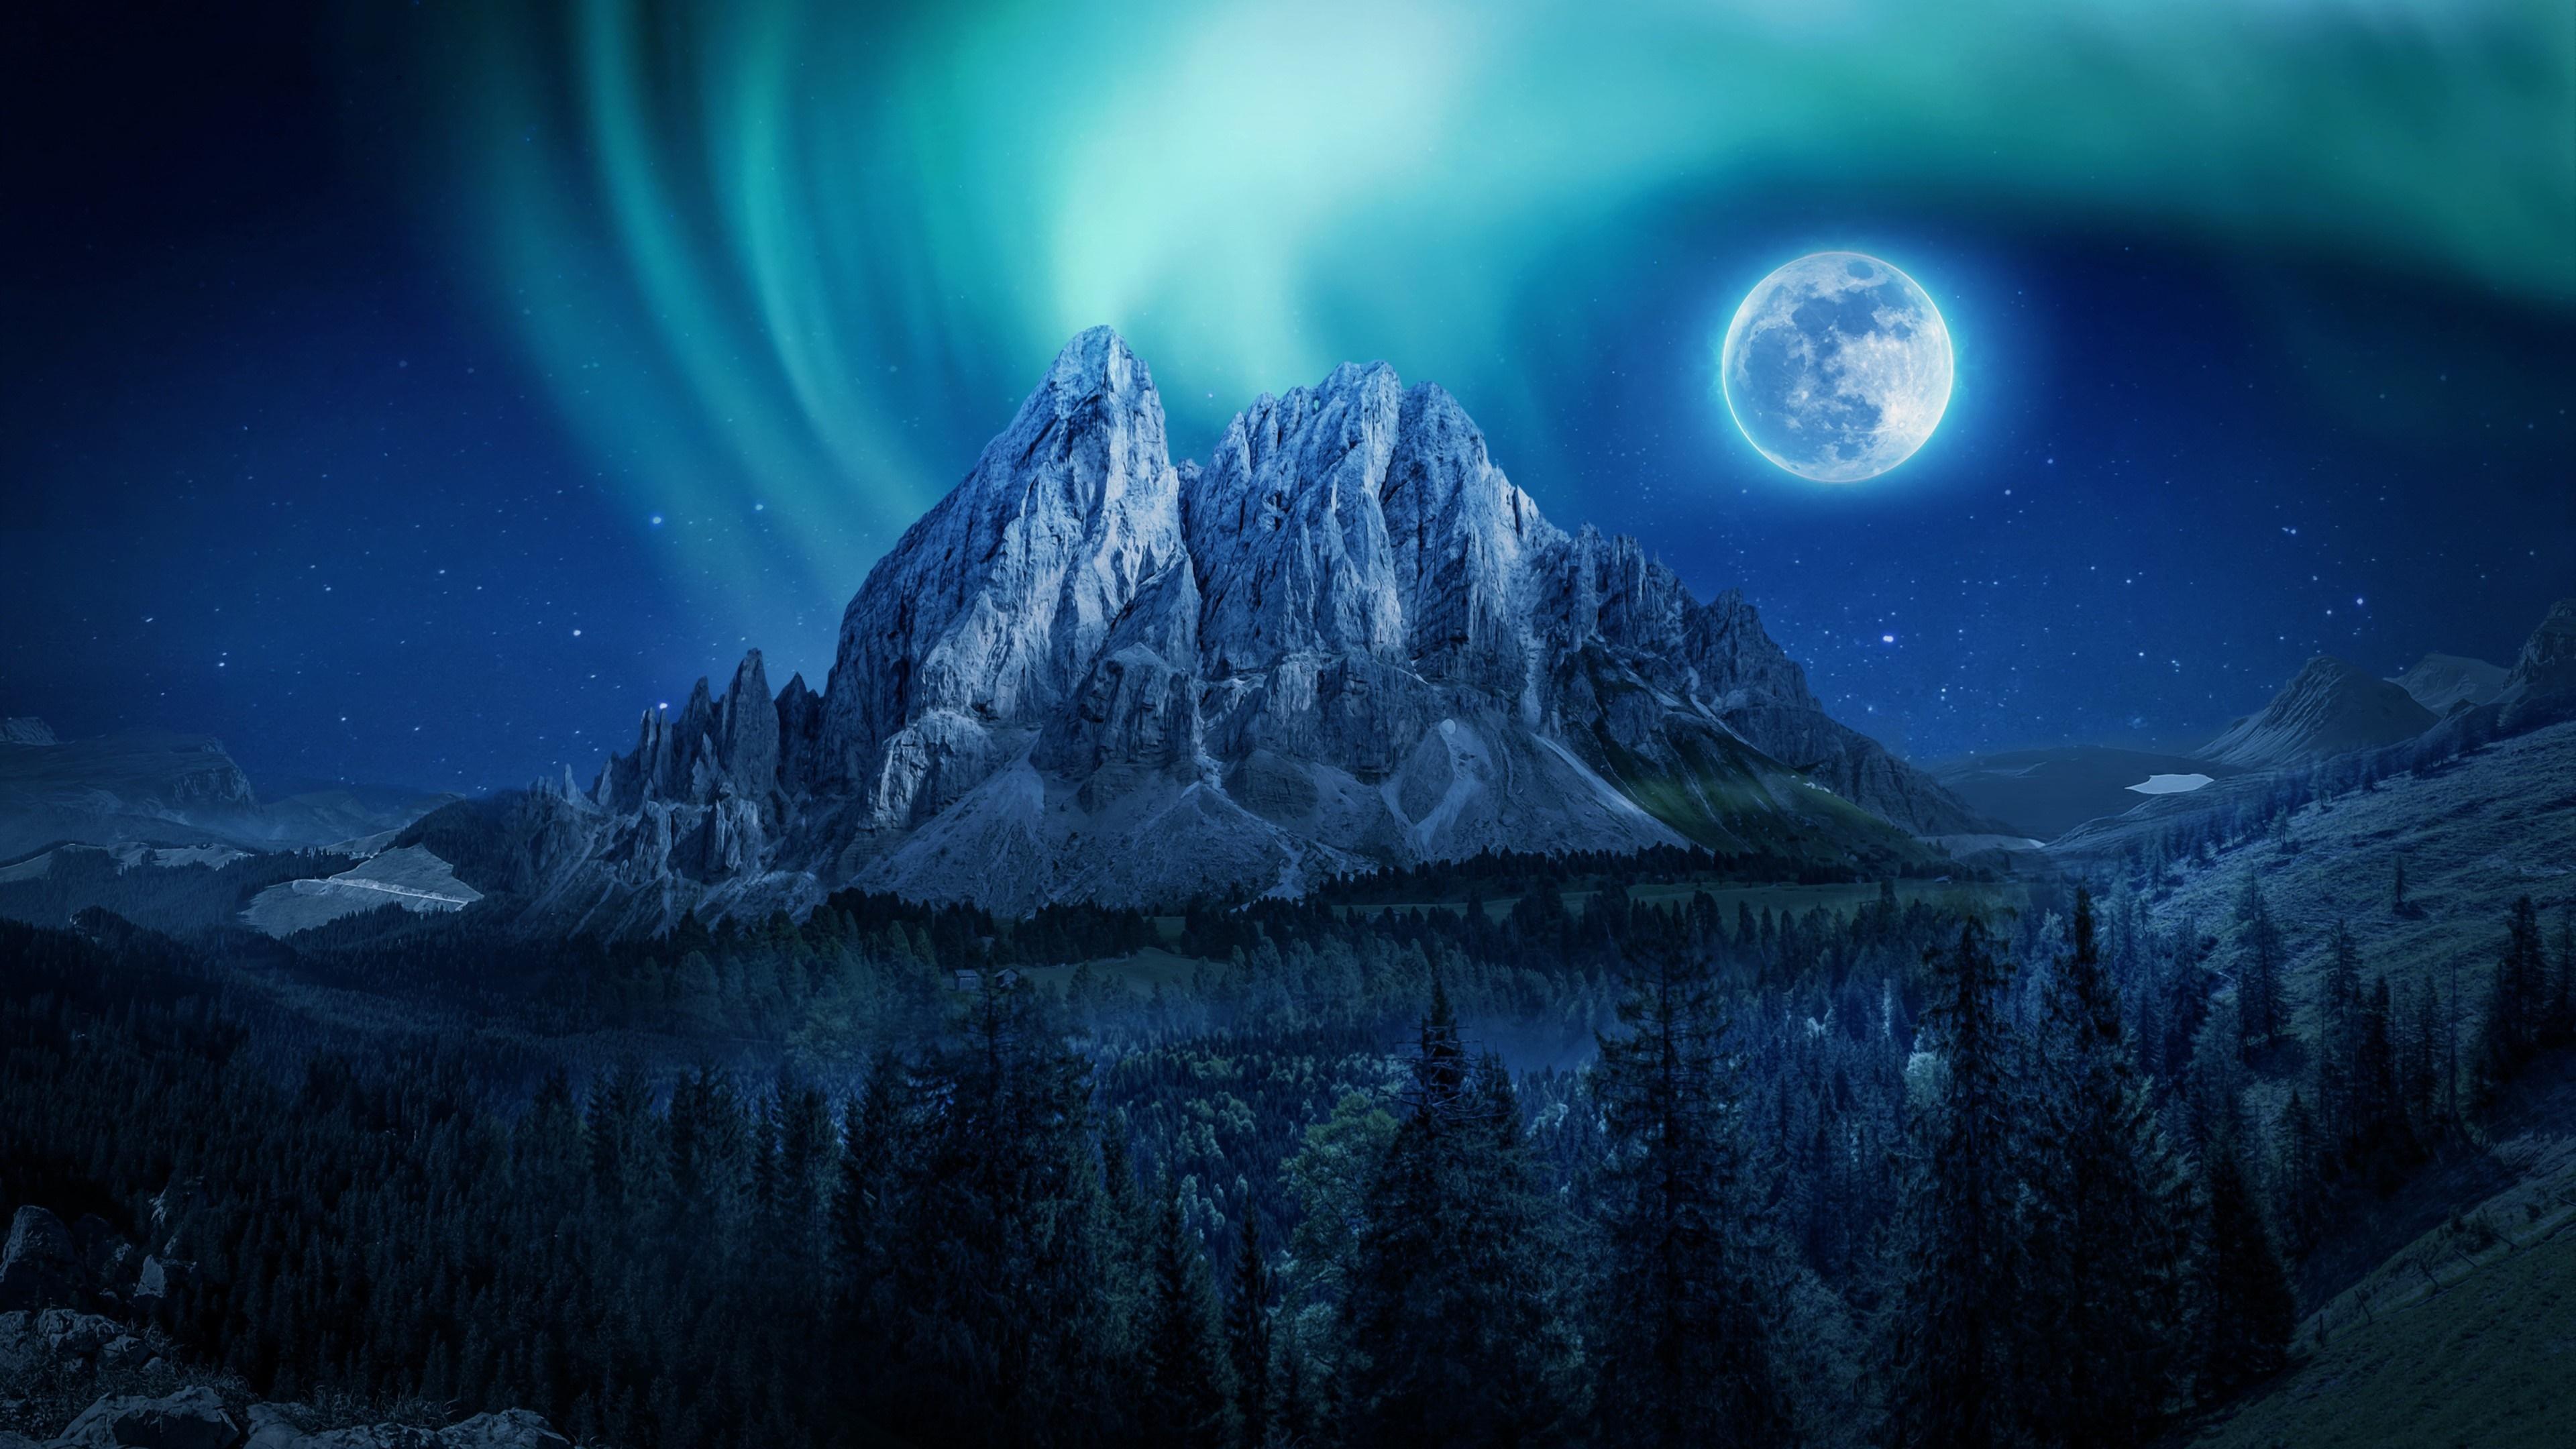 Aurora Borealis And Full Moon Over Mountain 4k Ultra Hd